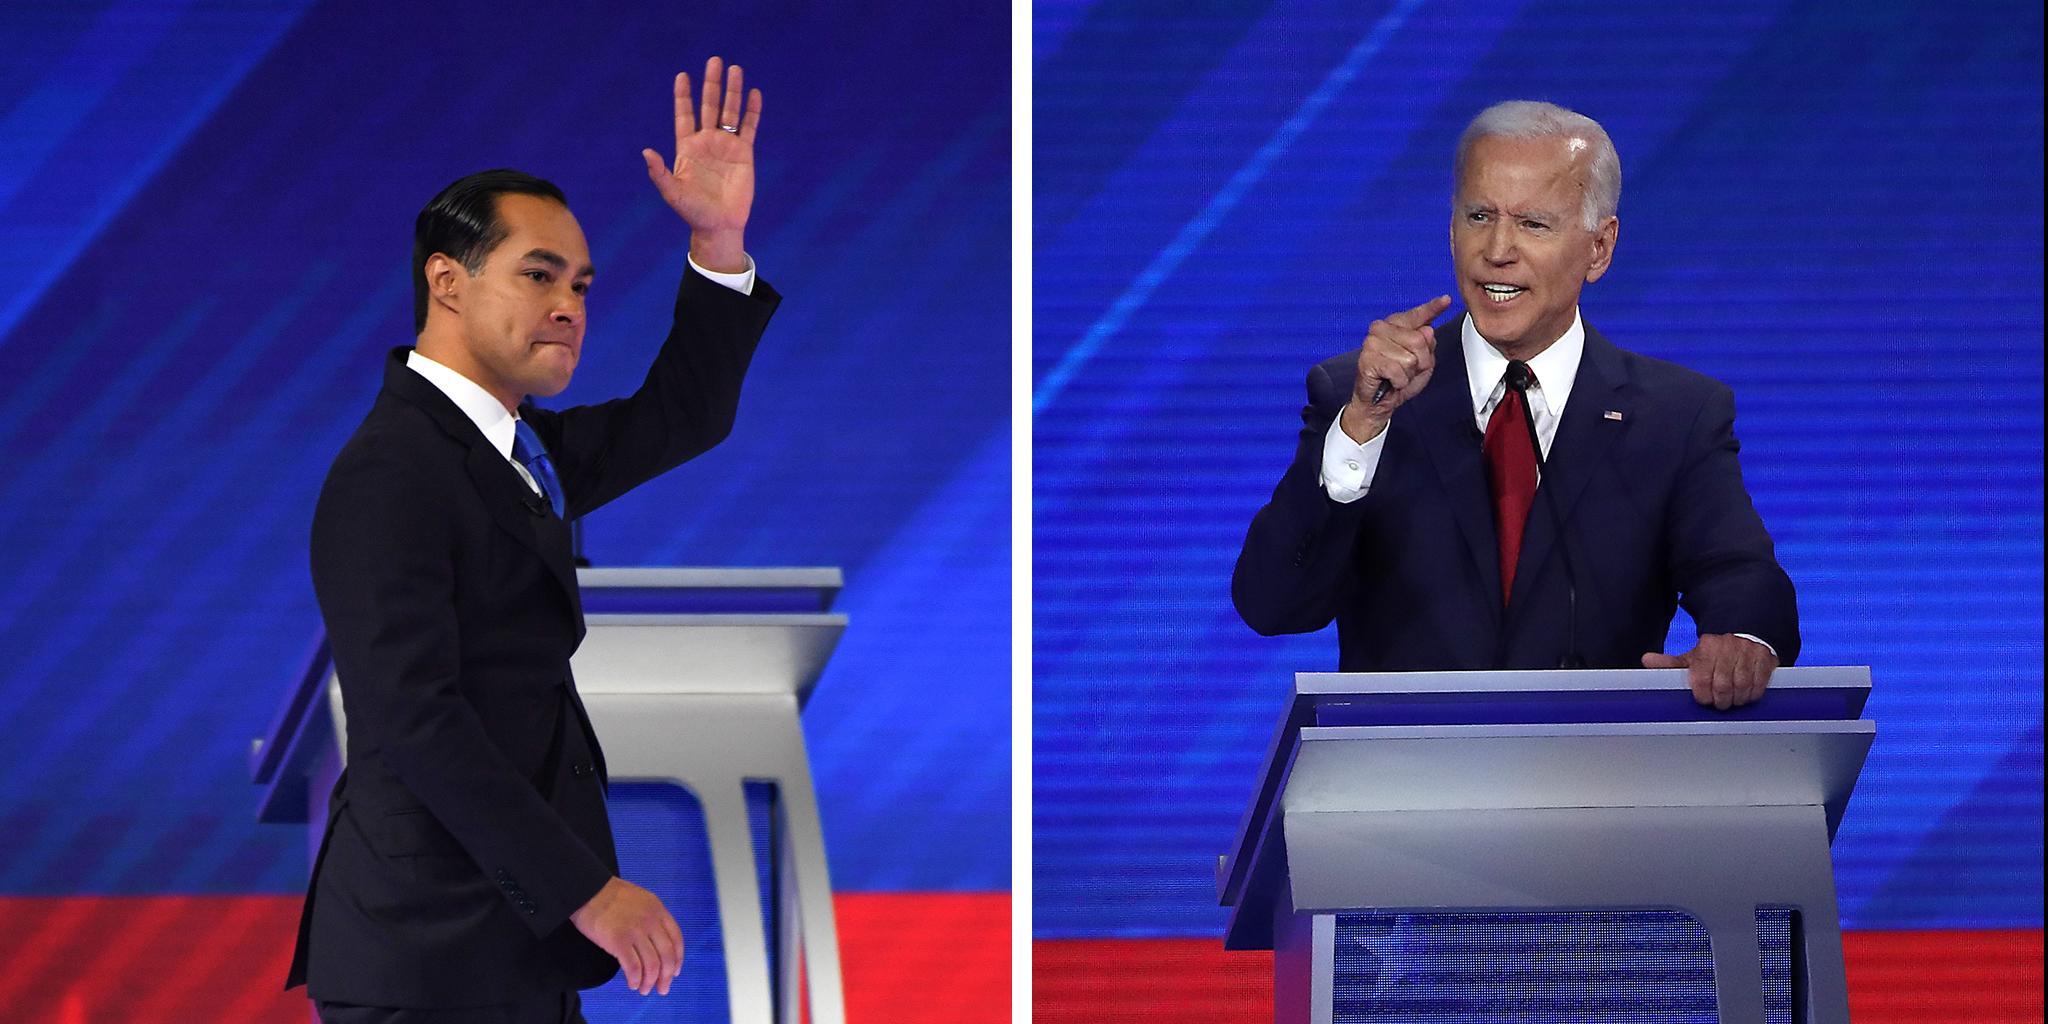 Democratic presidential hopeful former housing secretary Julian Castro and Democratic presidential candidate former Vice President Joe Biden